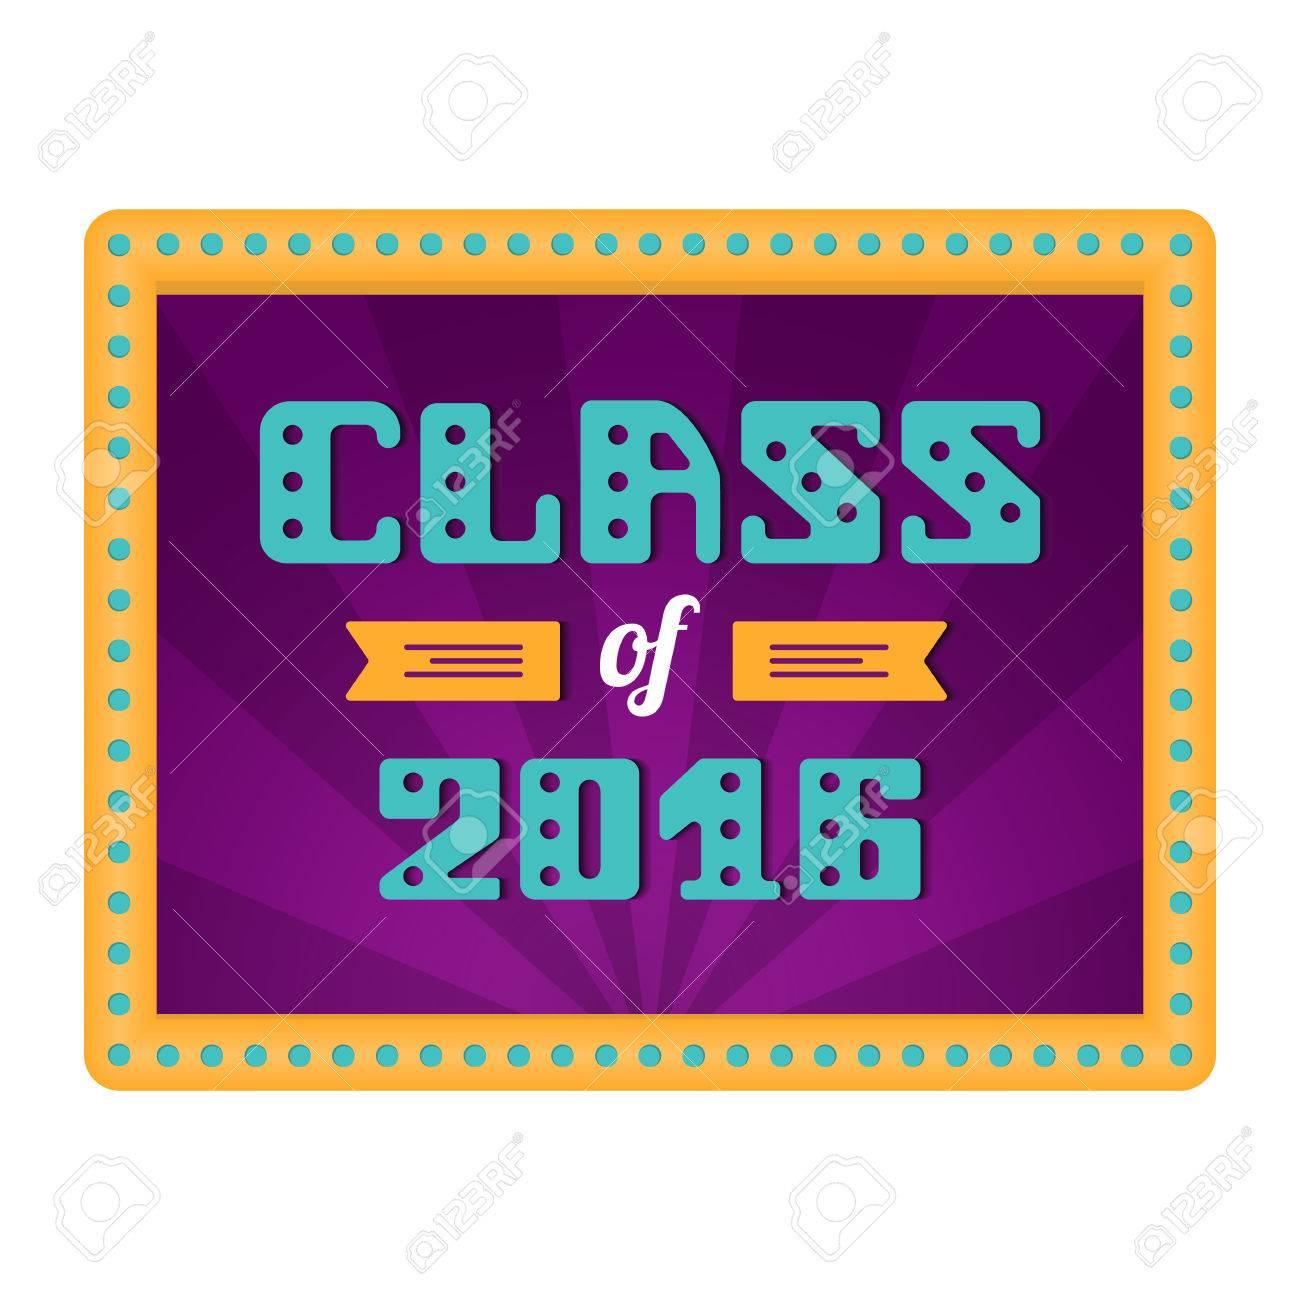 Class Of 2016 High School Graduate College Graduate Retro